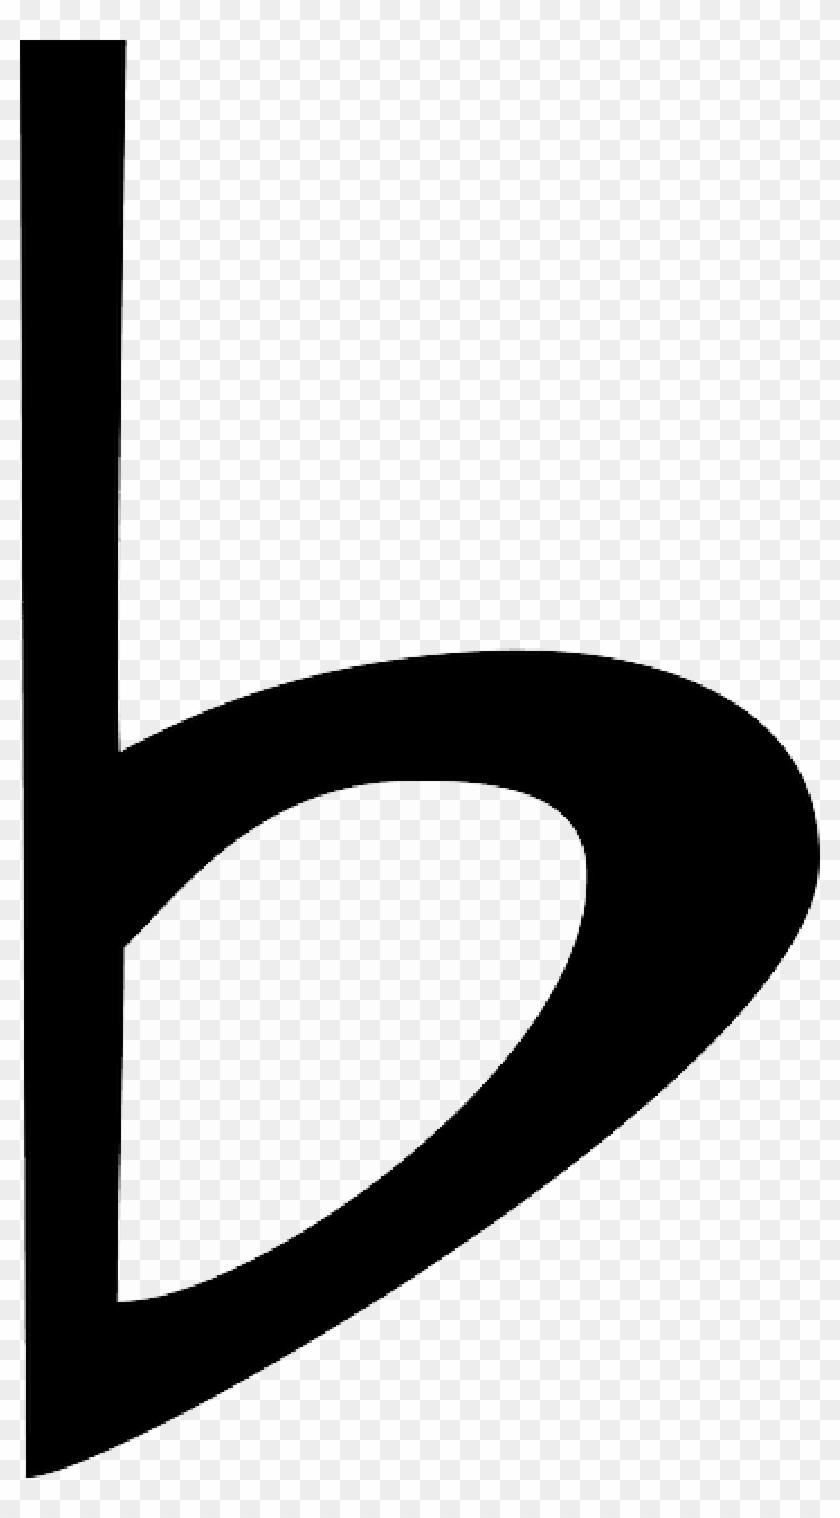 Music Notes Sharp Flat Symbols.